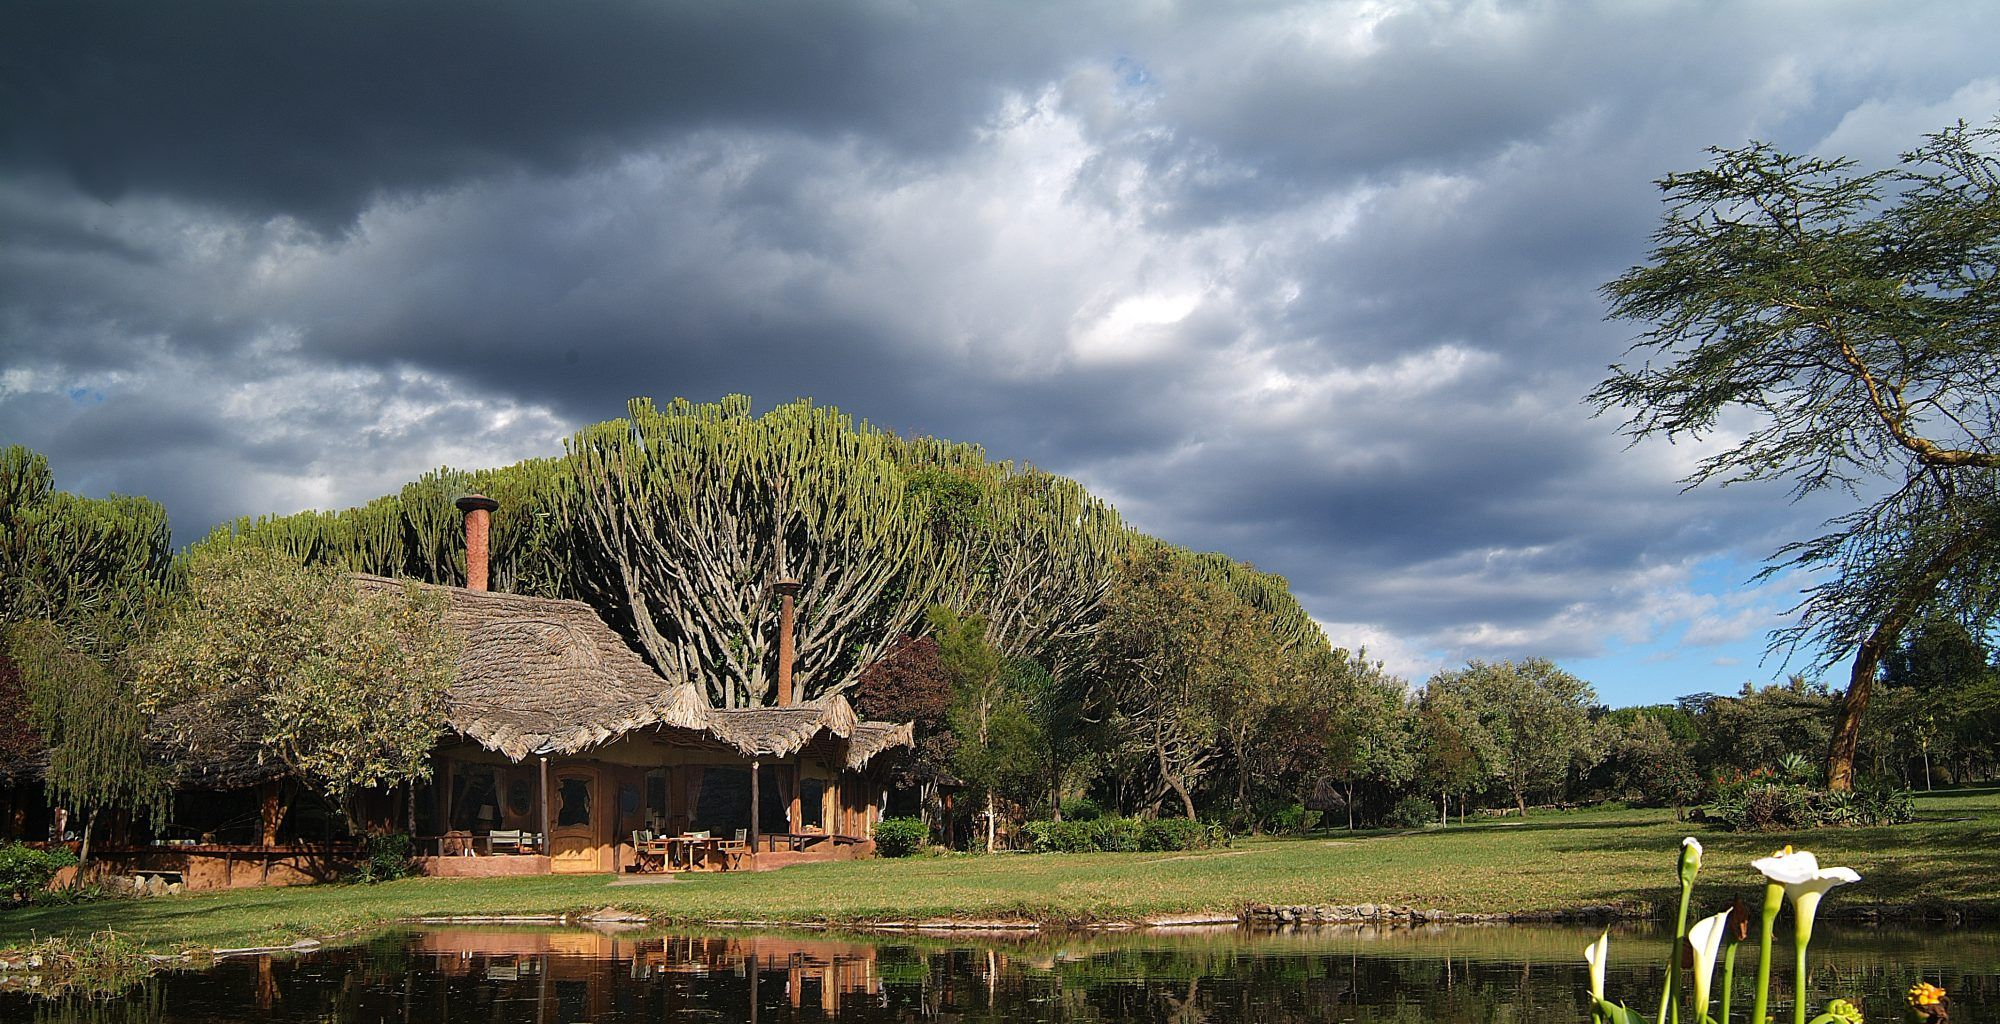 Kenya-Chui-Lodge-Exterior